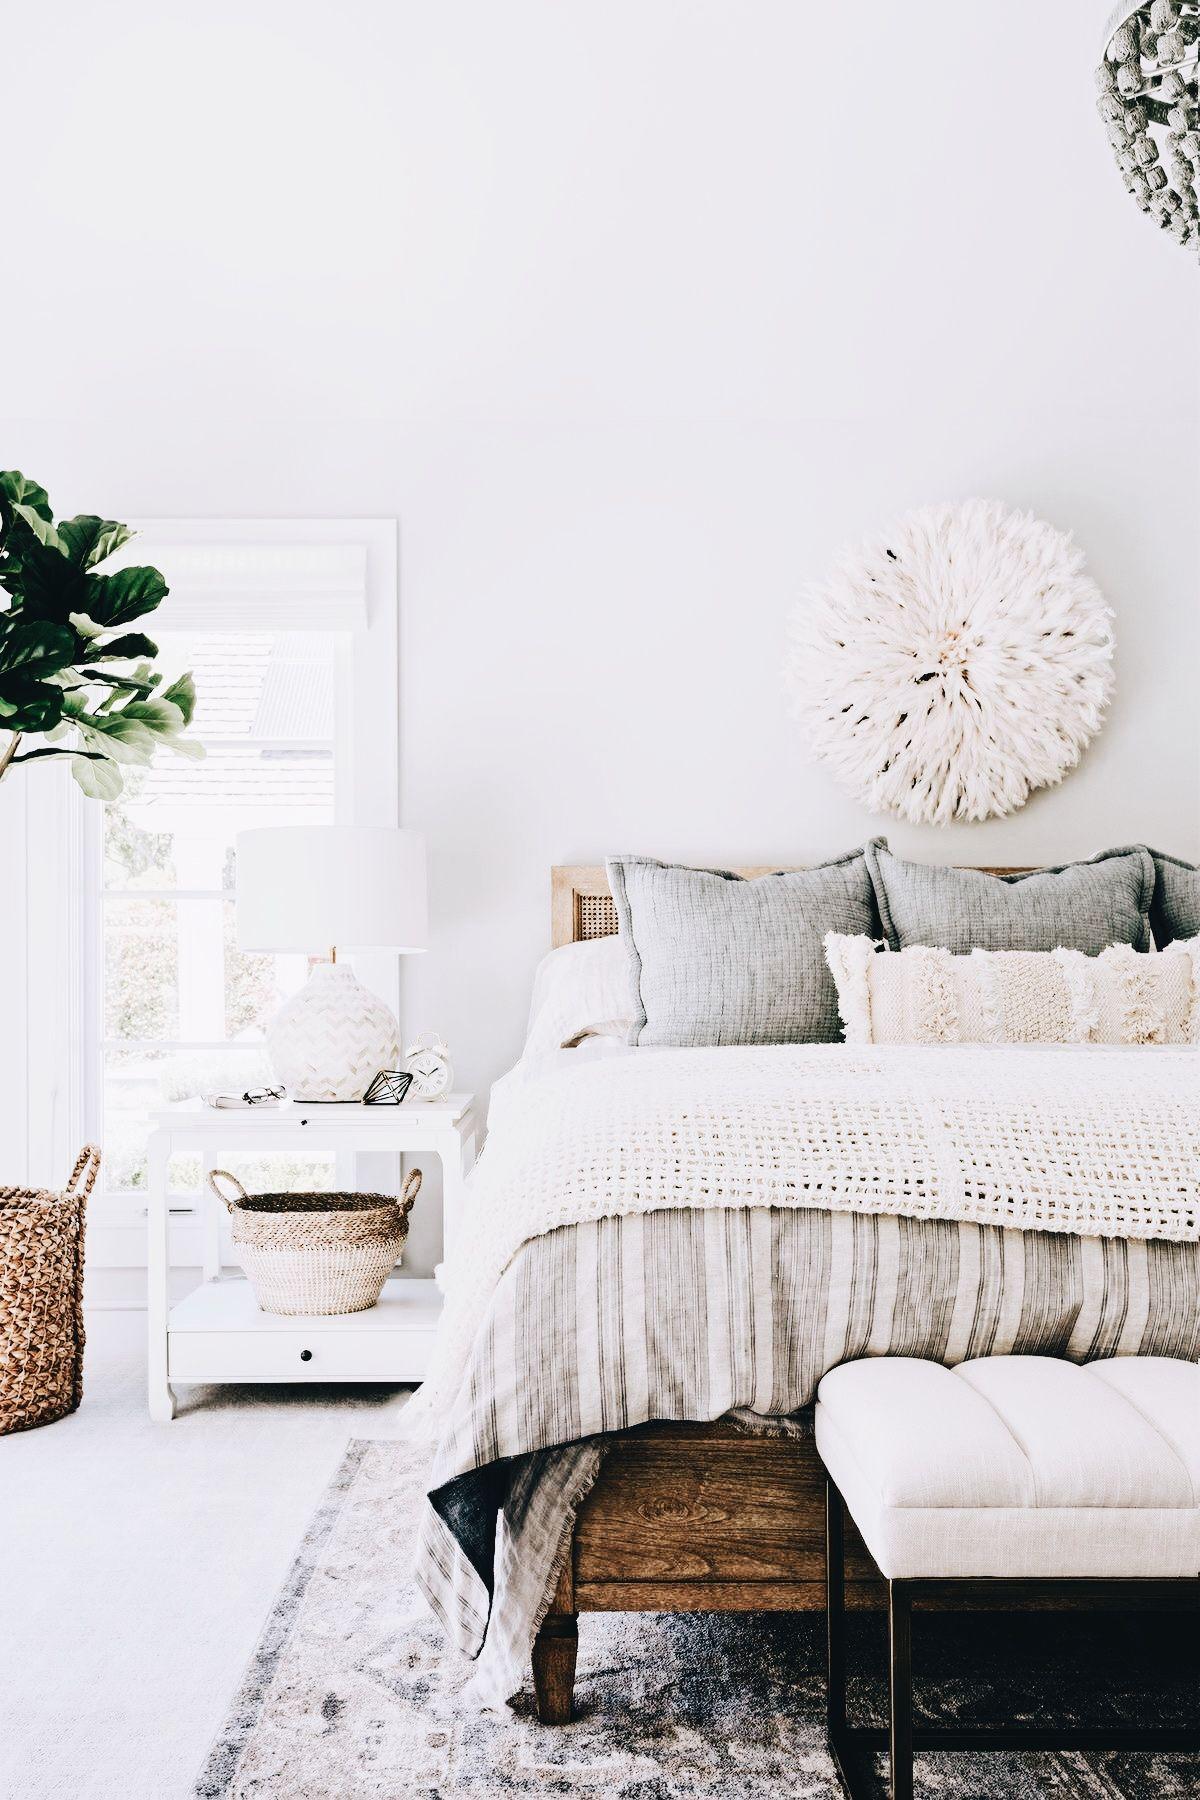 Bedroom Decor Home Decor Inspiration Rustic Modern Bedroom